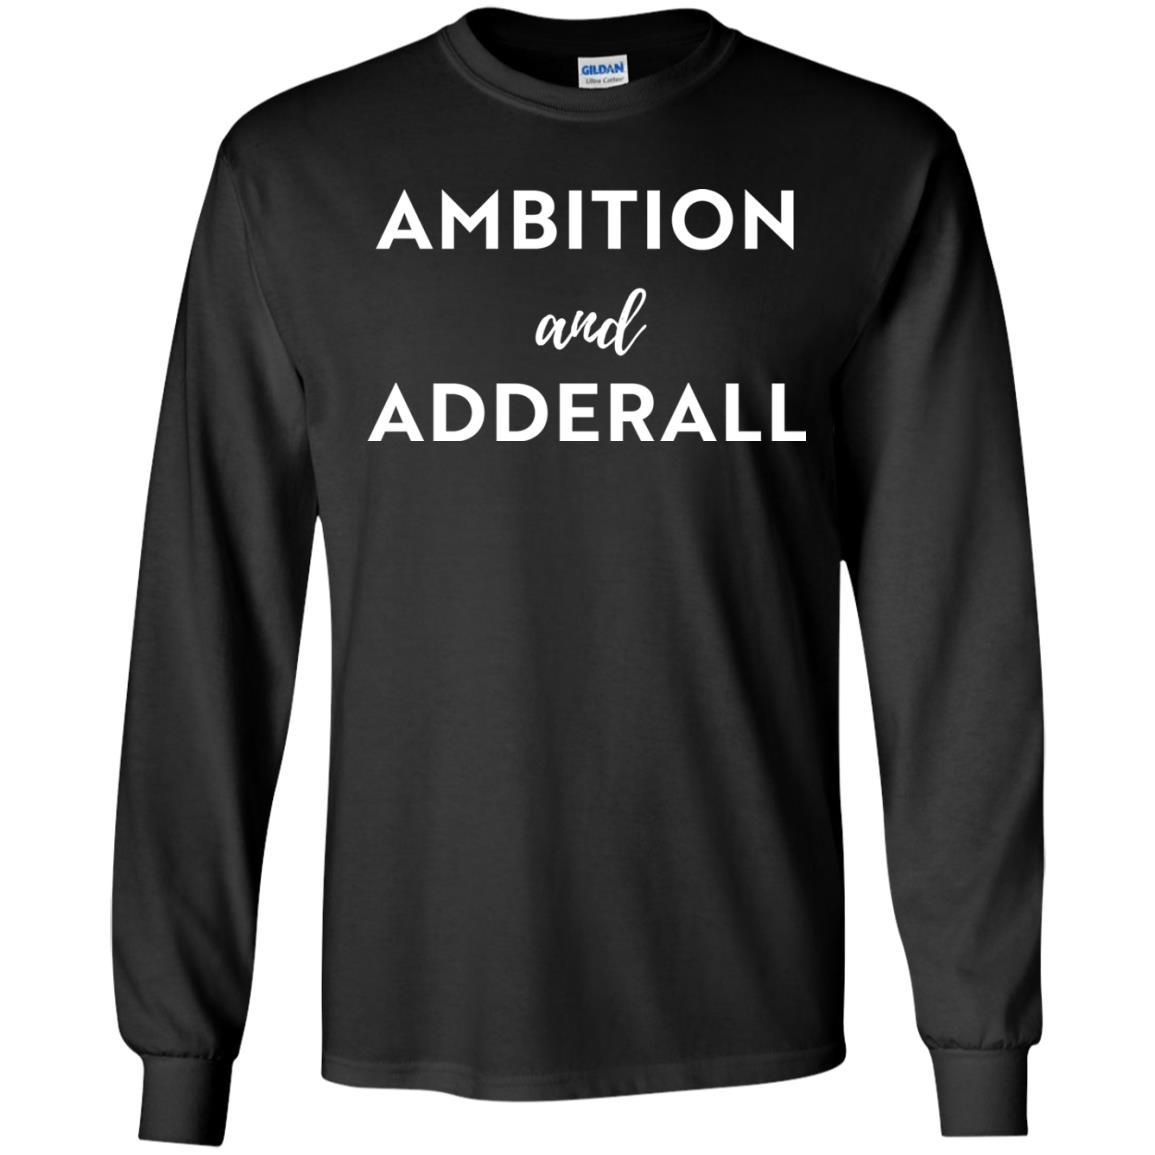 image 3 - Ambition and Adderall T-shirt, Sweatshirt